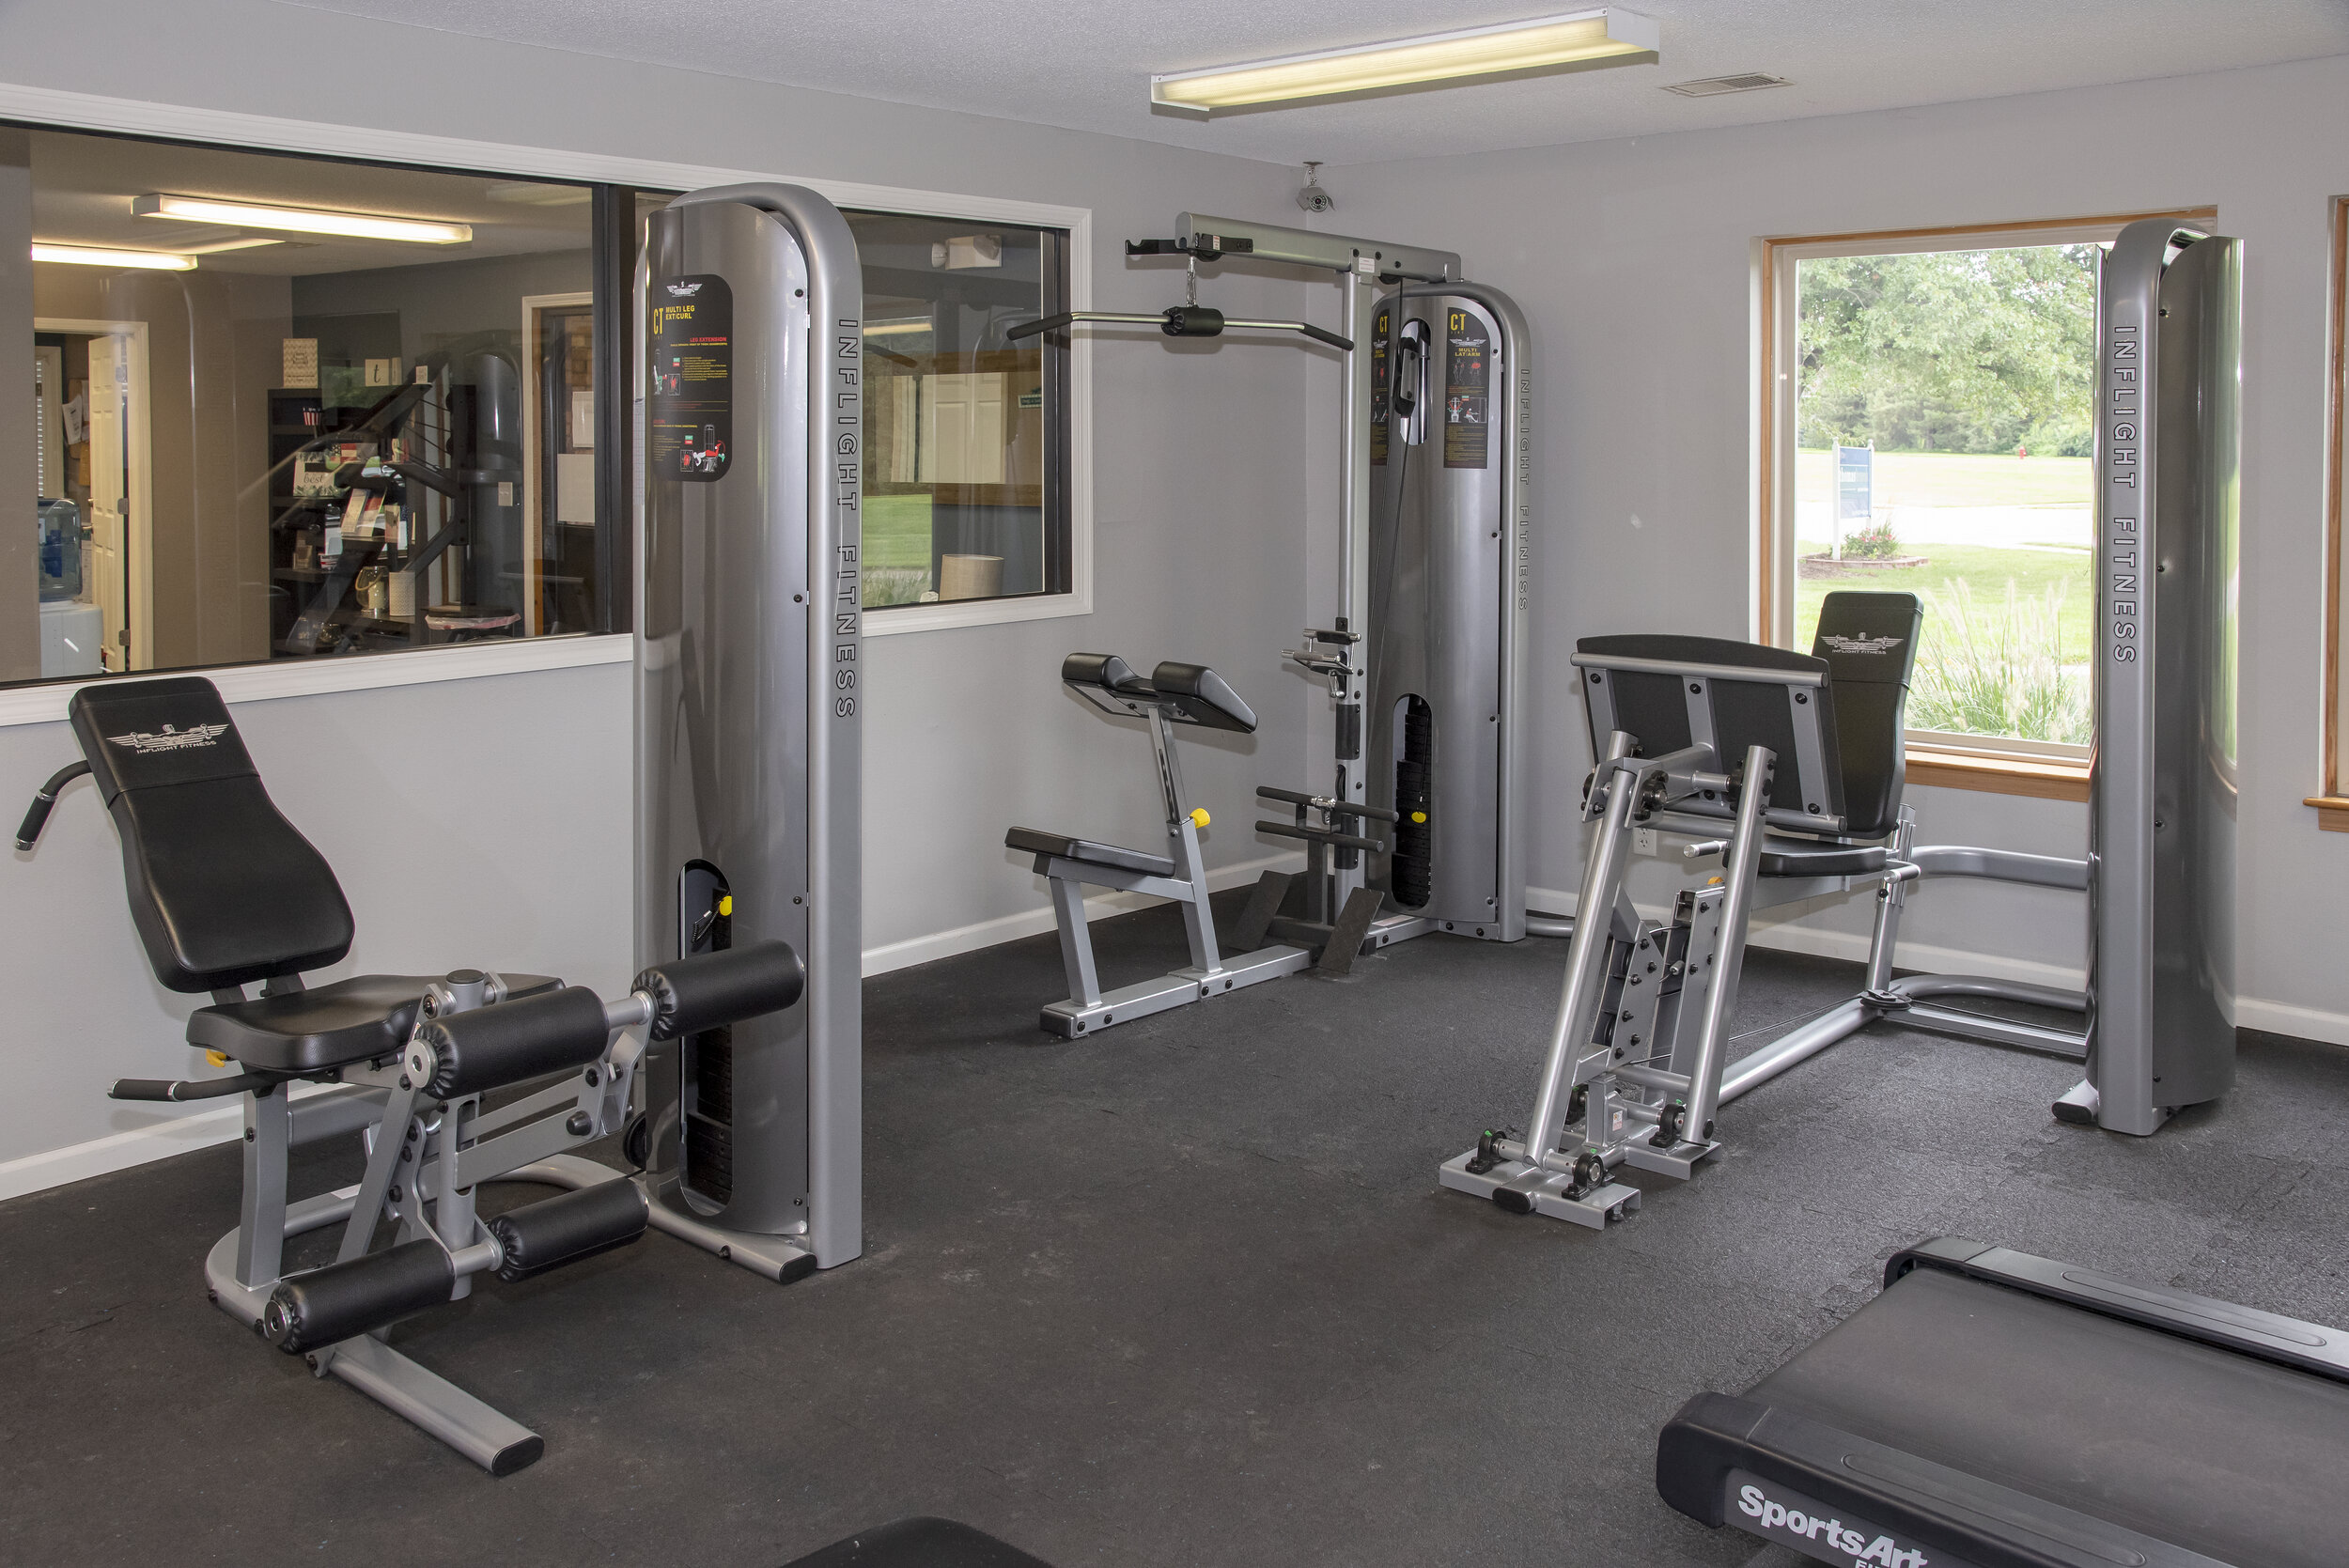 10 Fitness Center with Cardio _ Strength Equipment.jpg